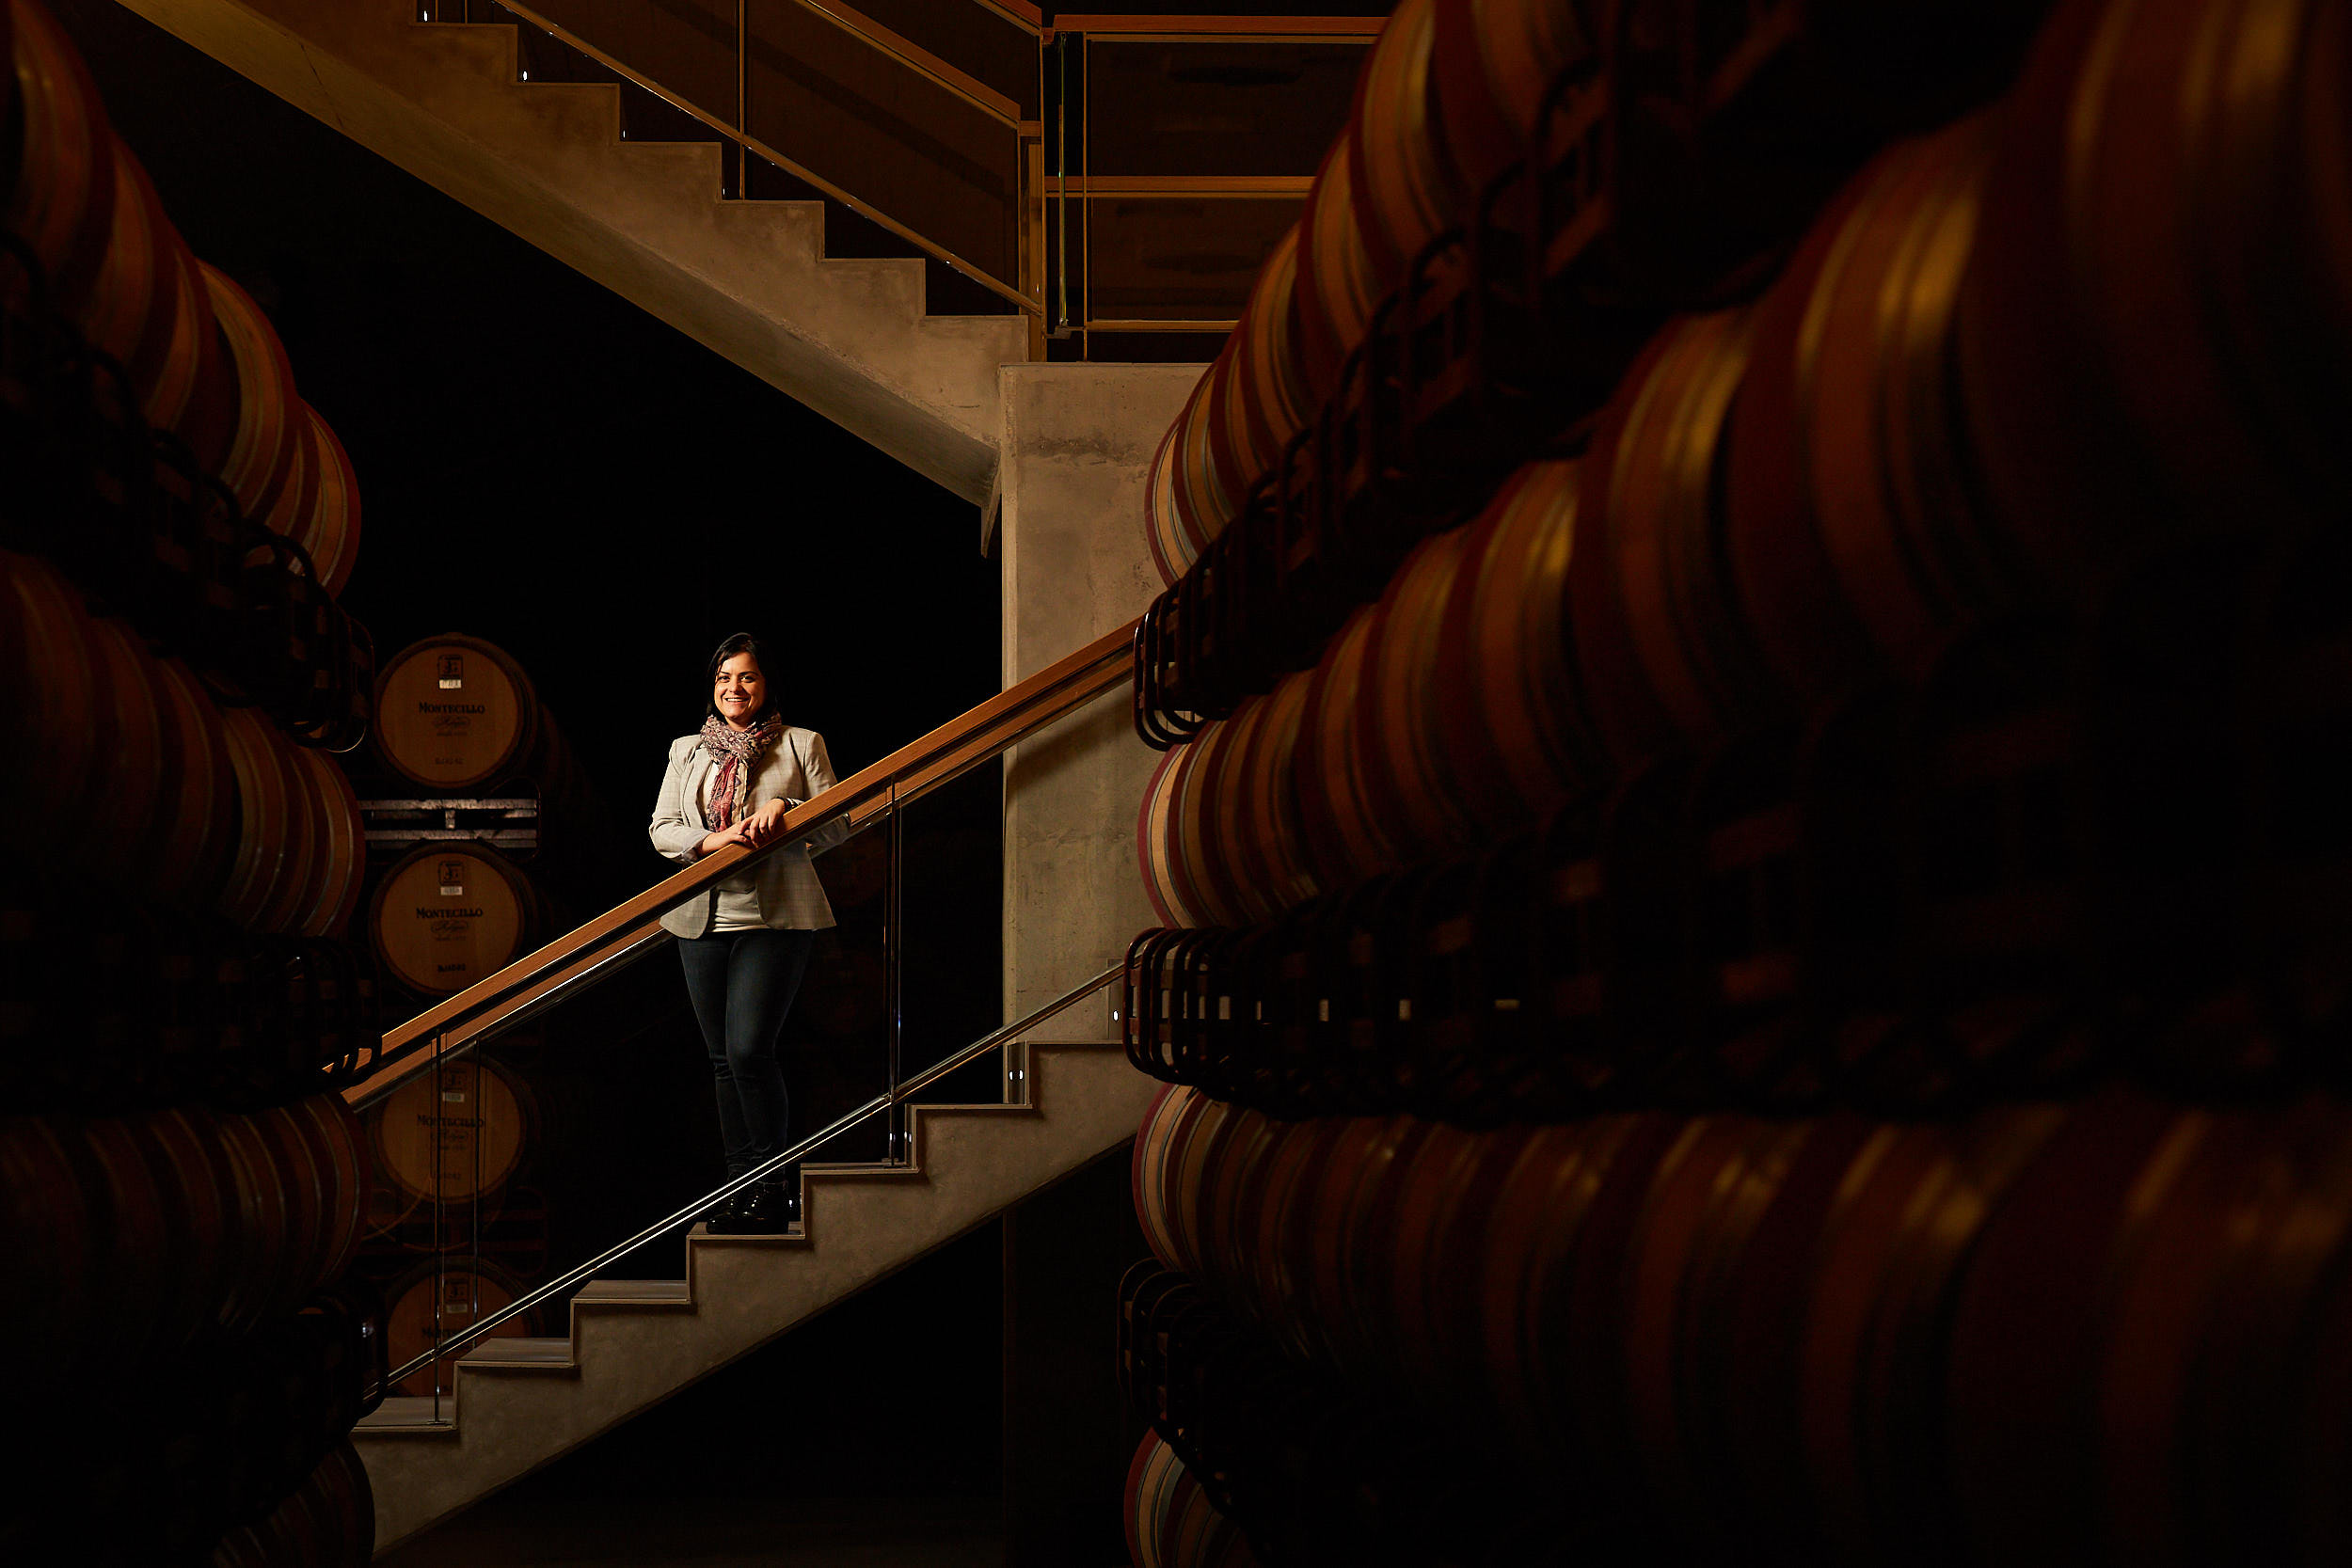 1805fotografia-profesional-corporativa-vino-rioja-espana-James-Sturcke_0021.jpg